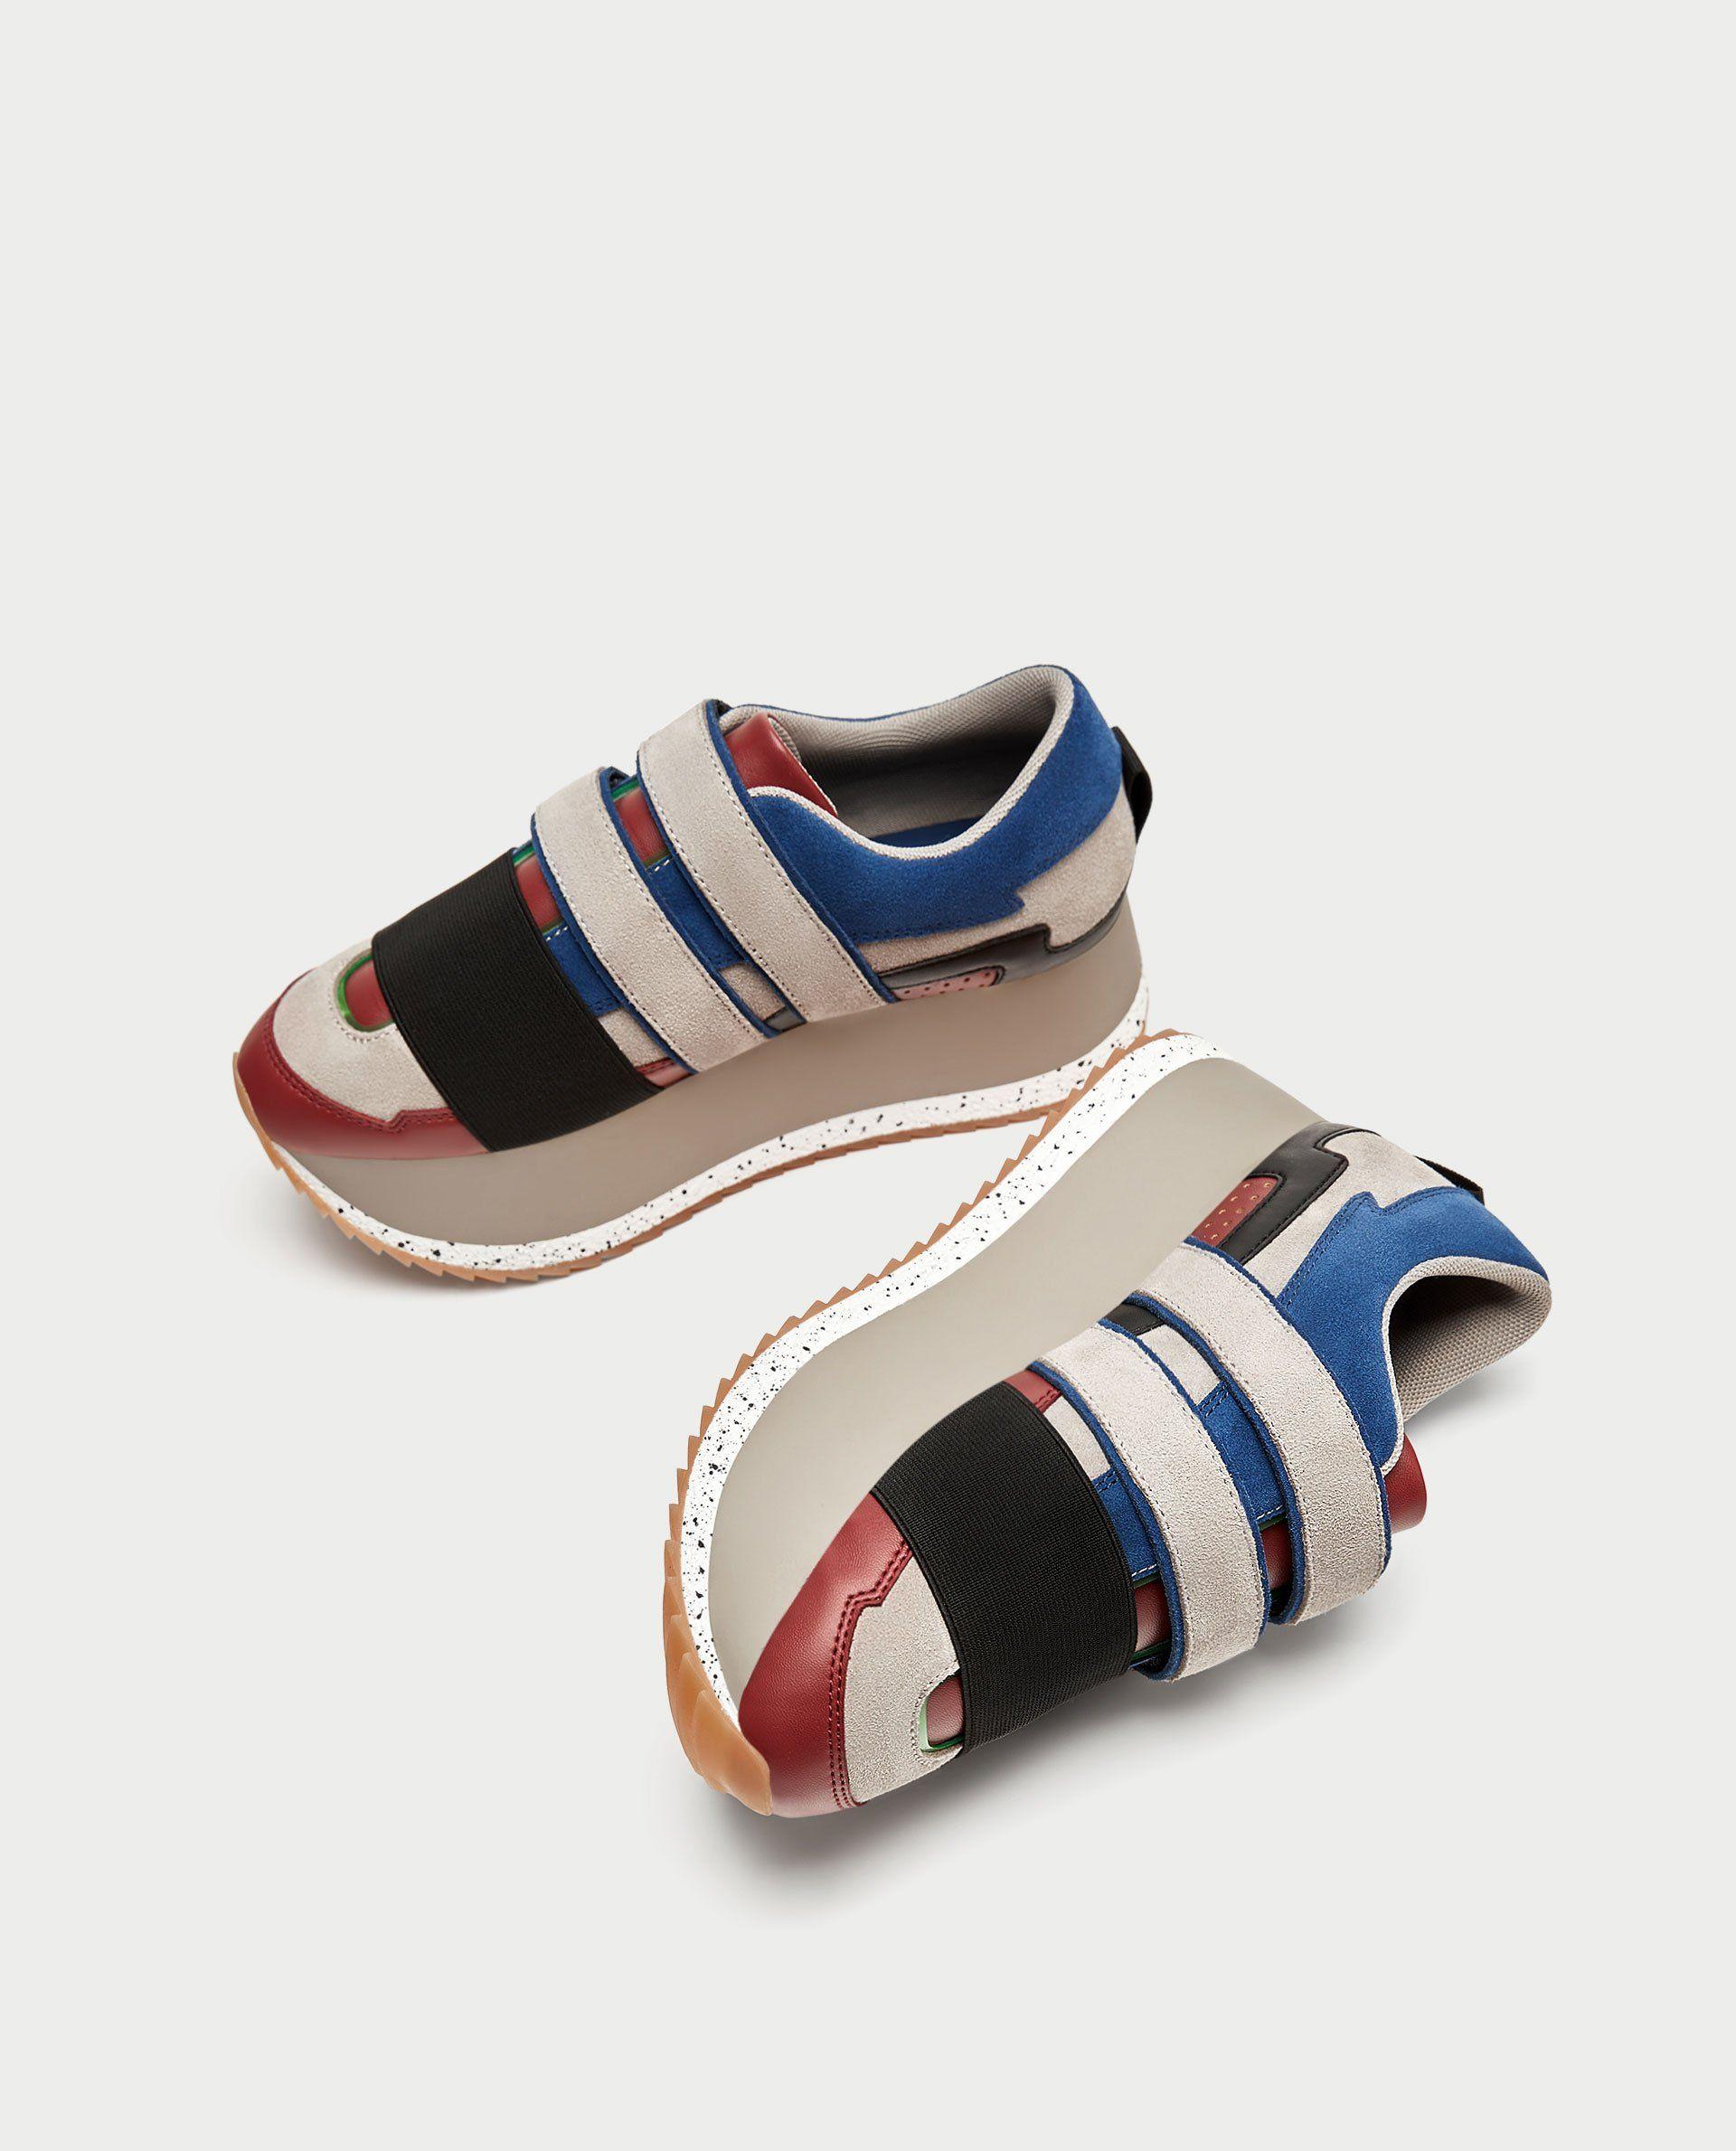 Zara Multicolored Platform Sneakers